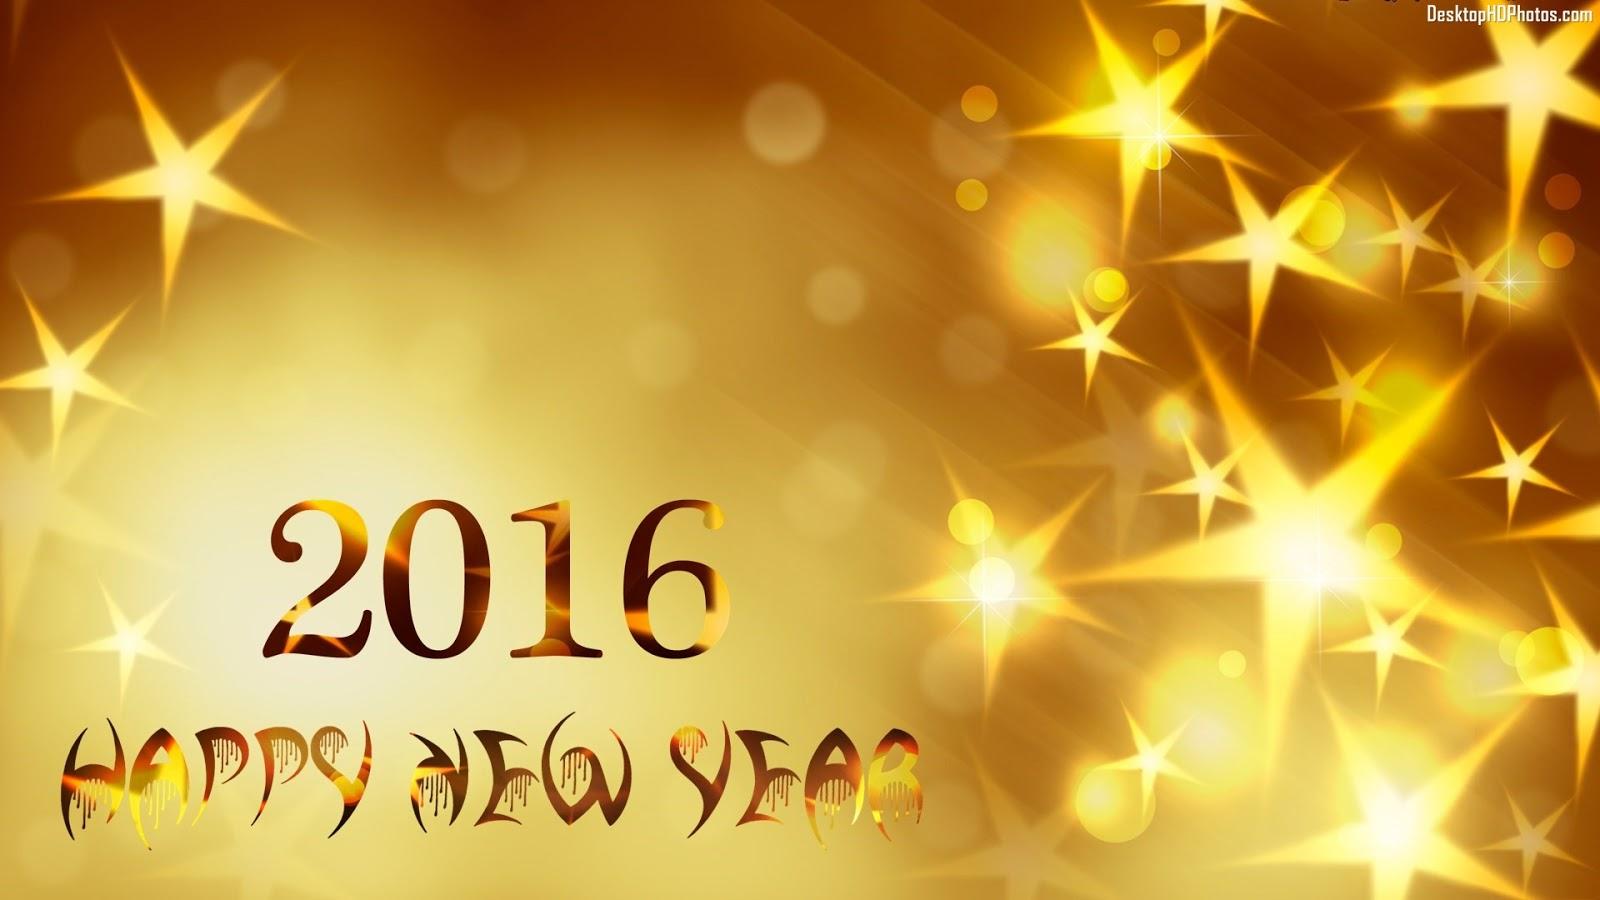 hinh-anh-tet-2016-xuan-2016-happy-new-year-2016-5.jpg